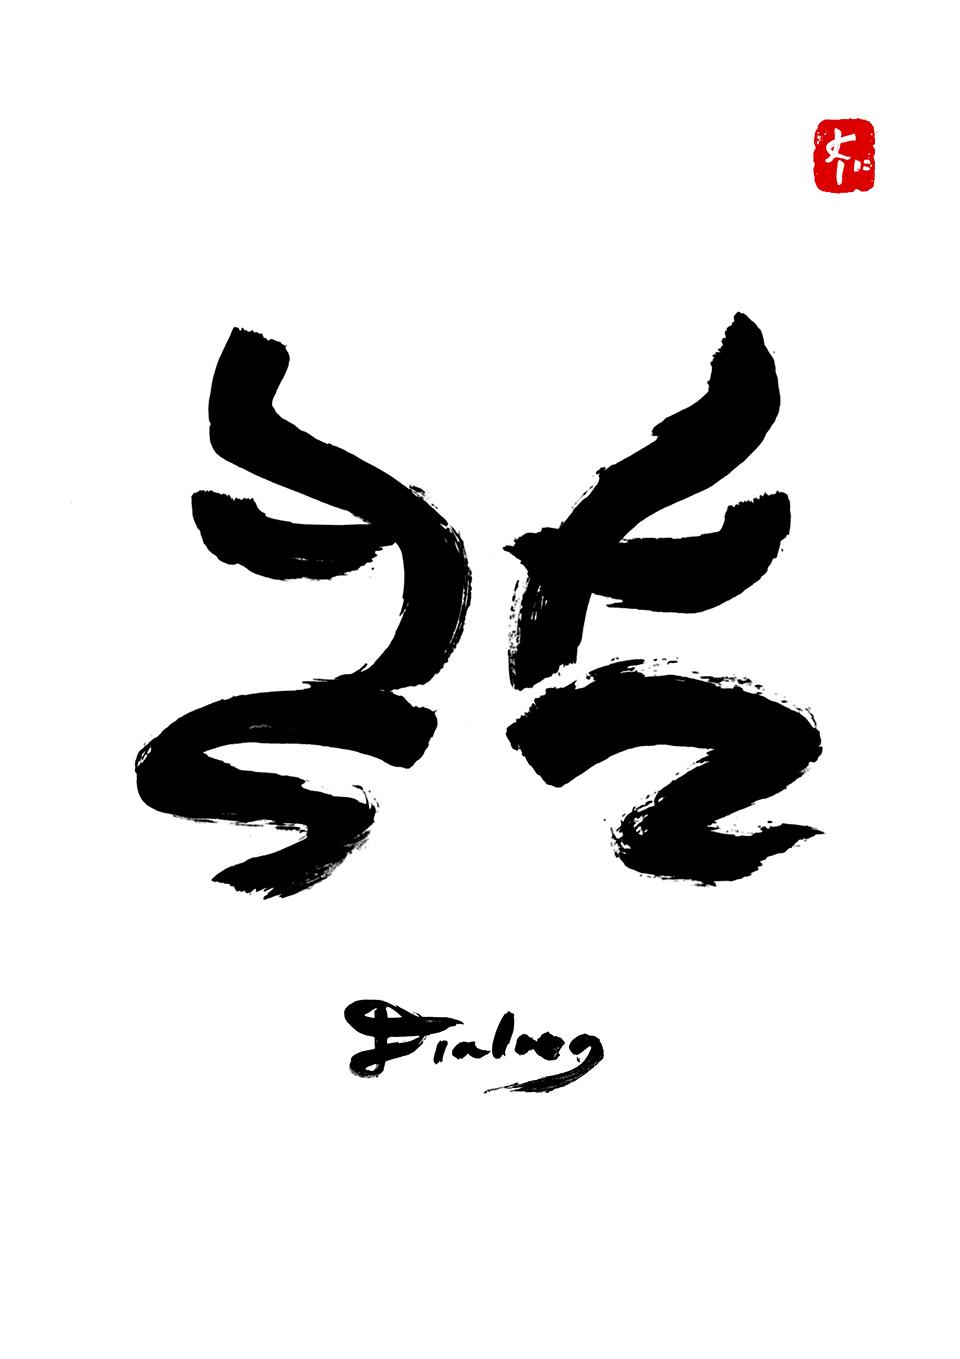 Dialoog-hieroglyyf